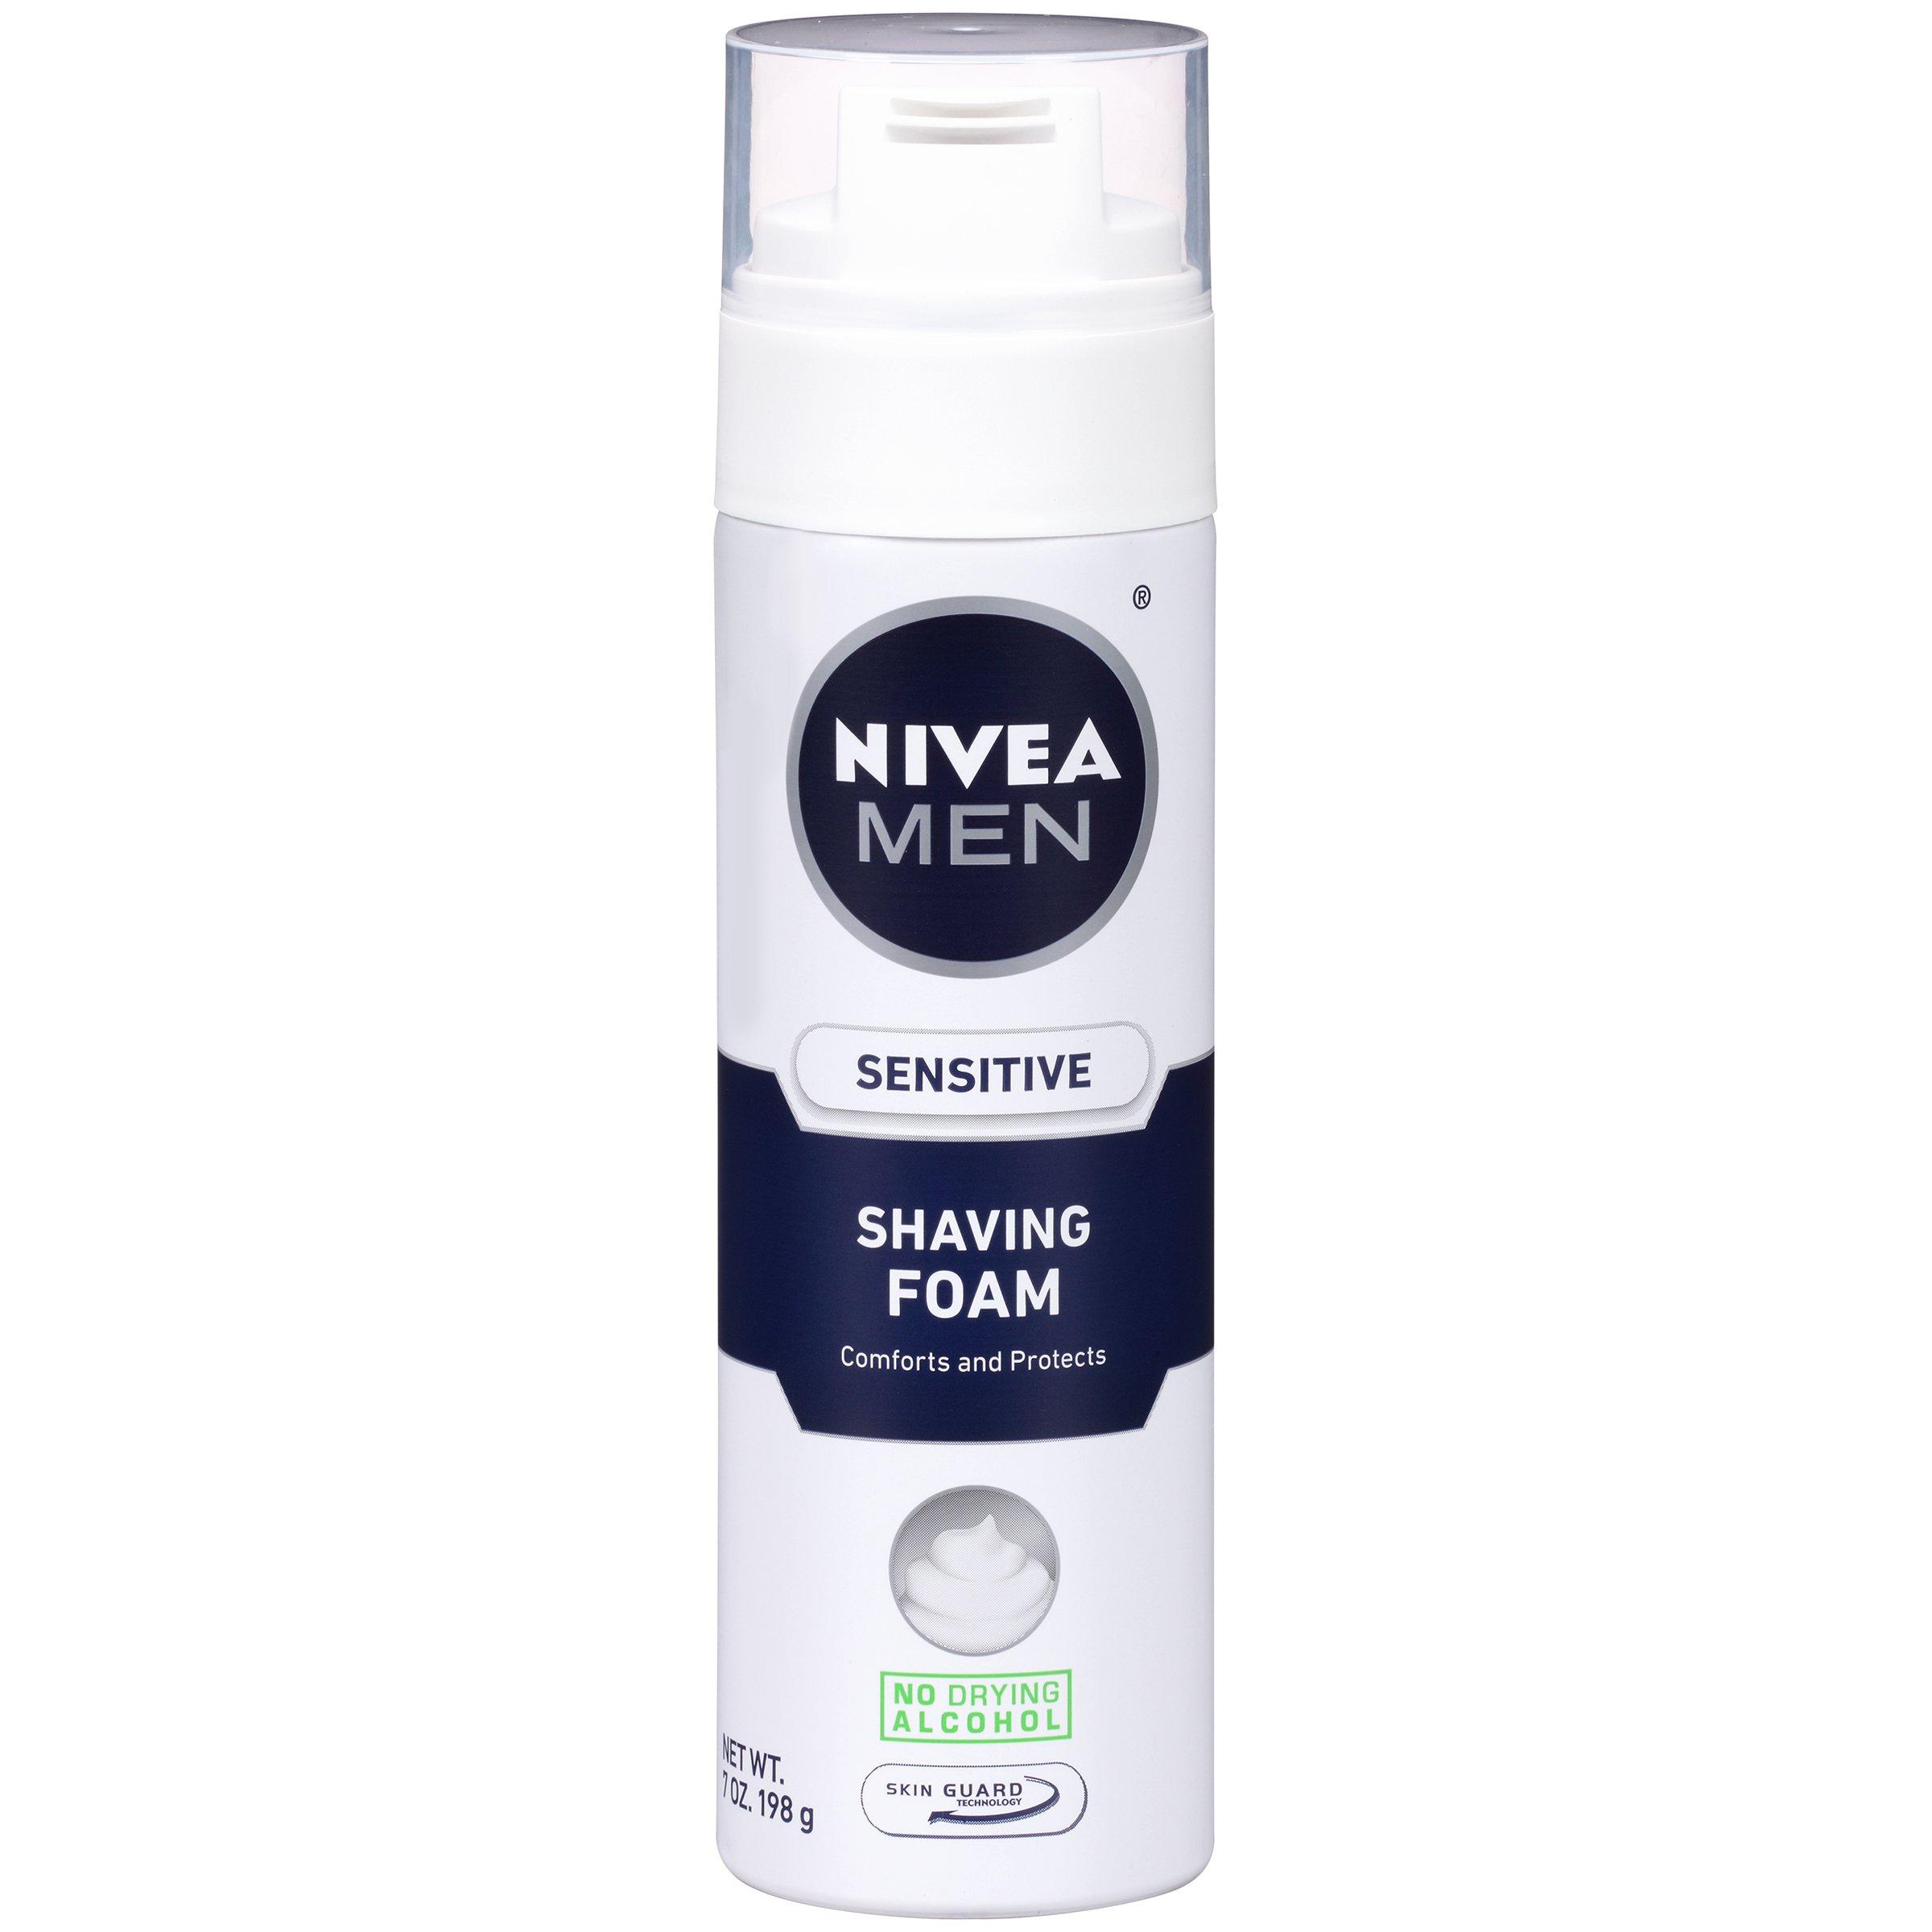 NIVEA Men Sensitive Shaving Foam 7 Ounce (Pack of 6)